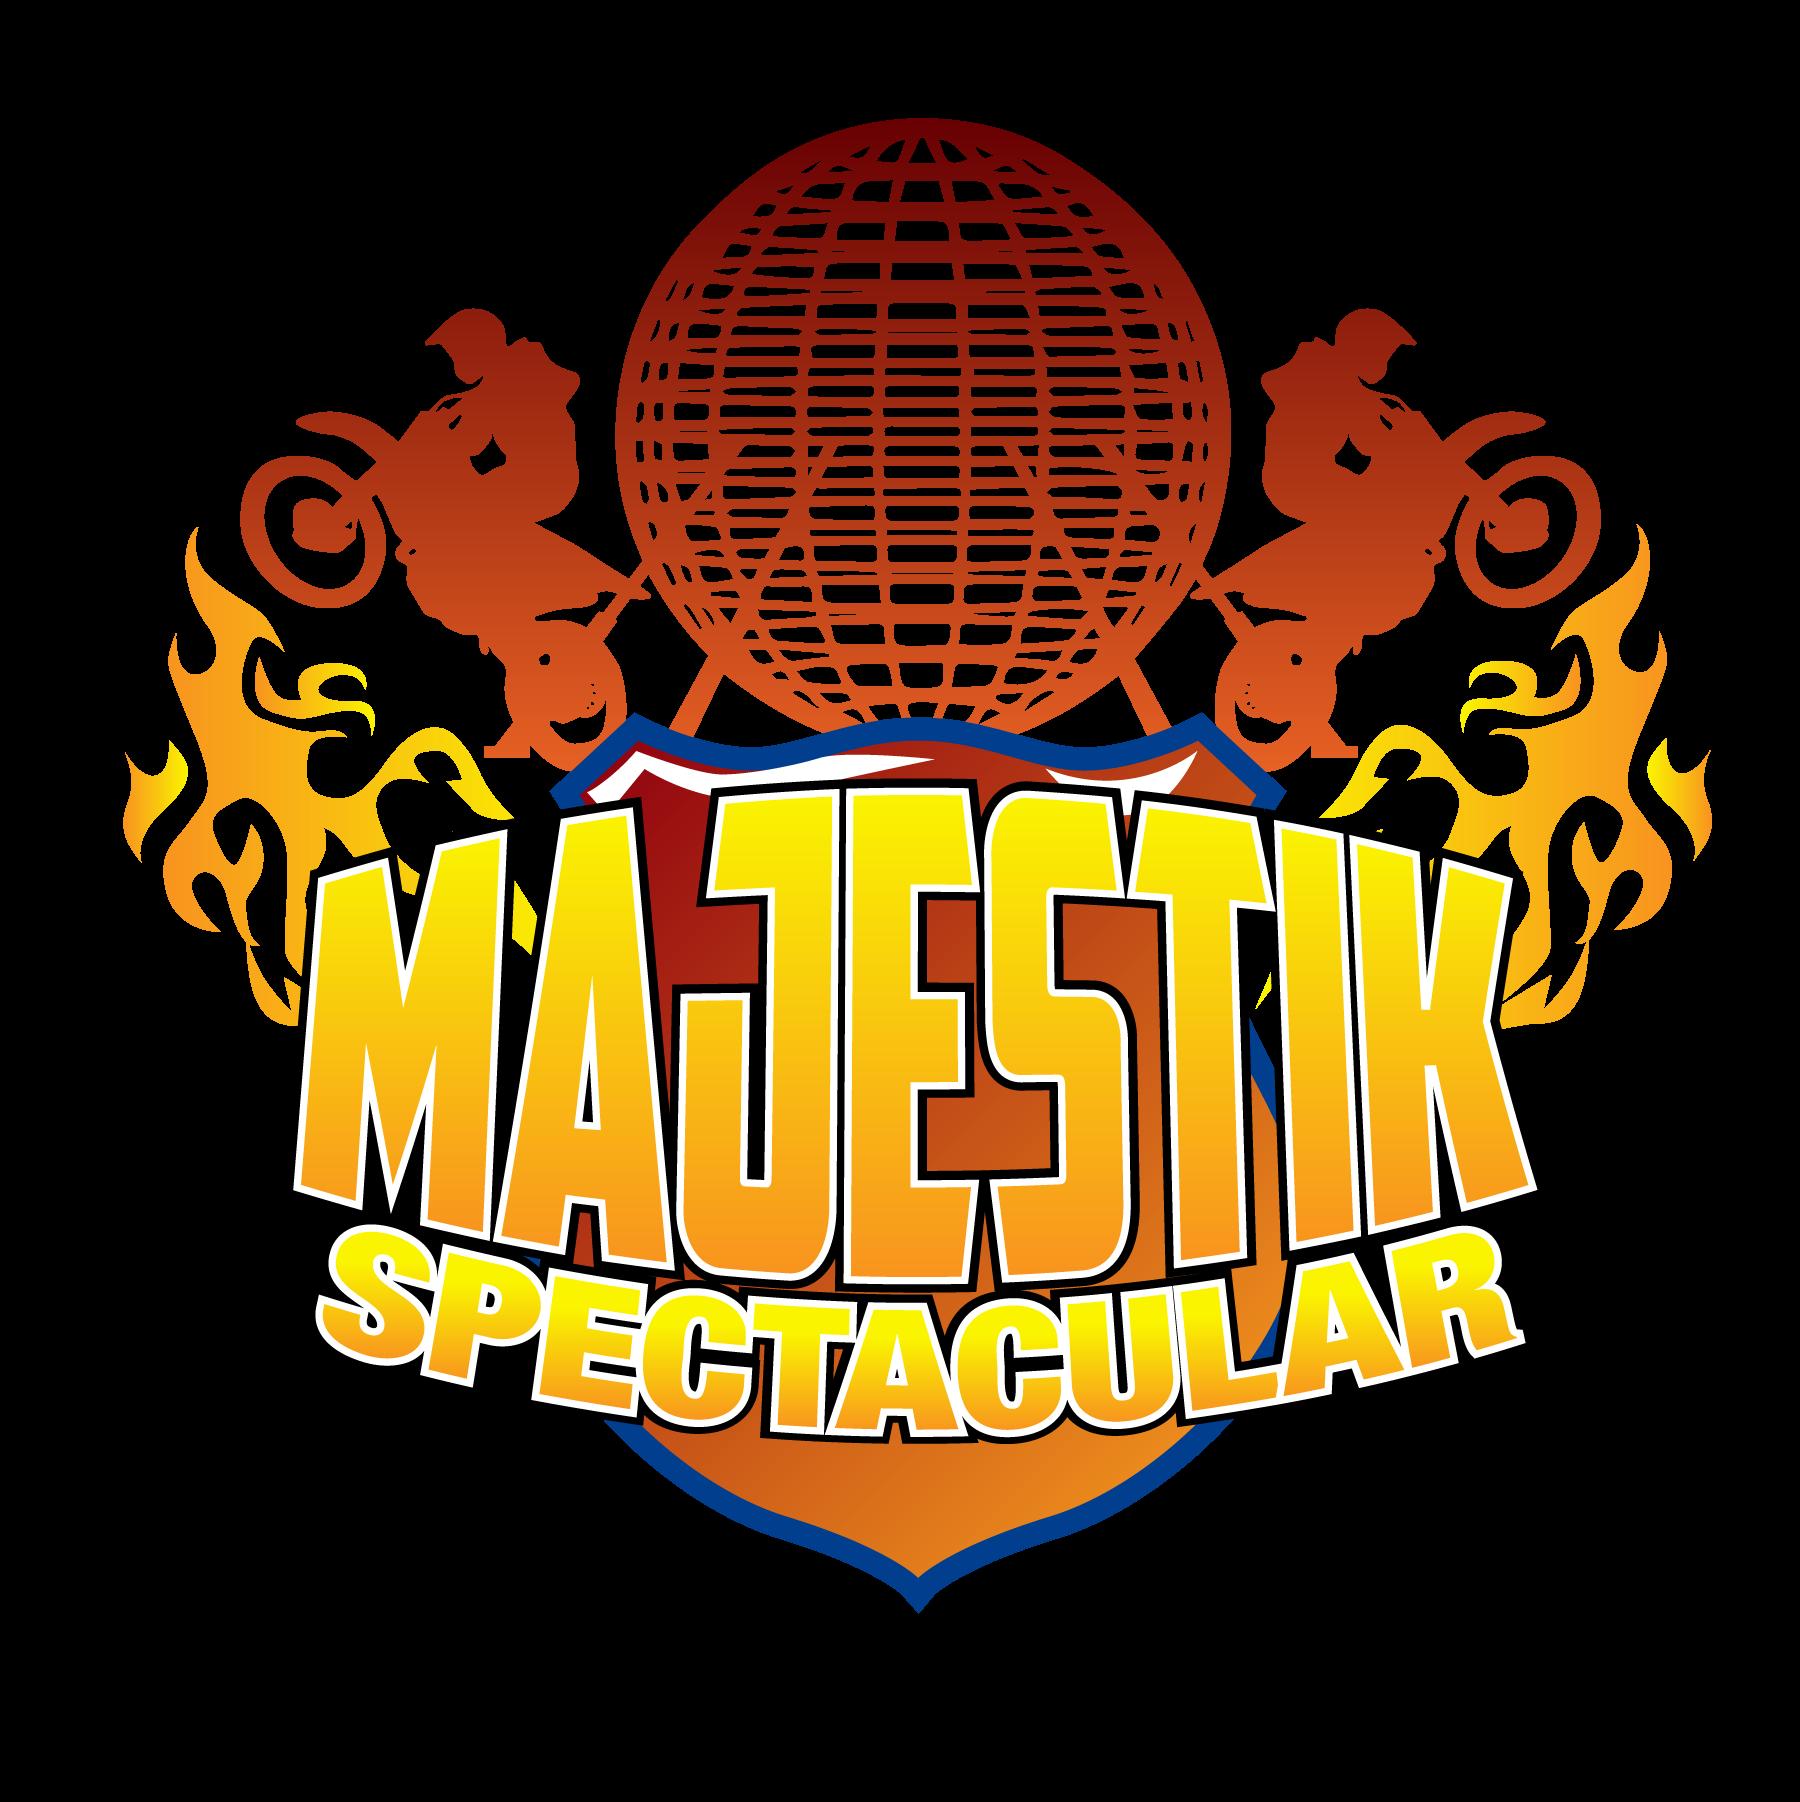 MAJESTIK-SPECTACULAR-3